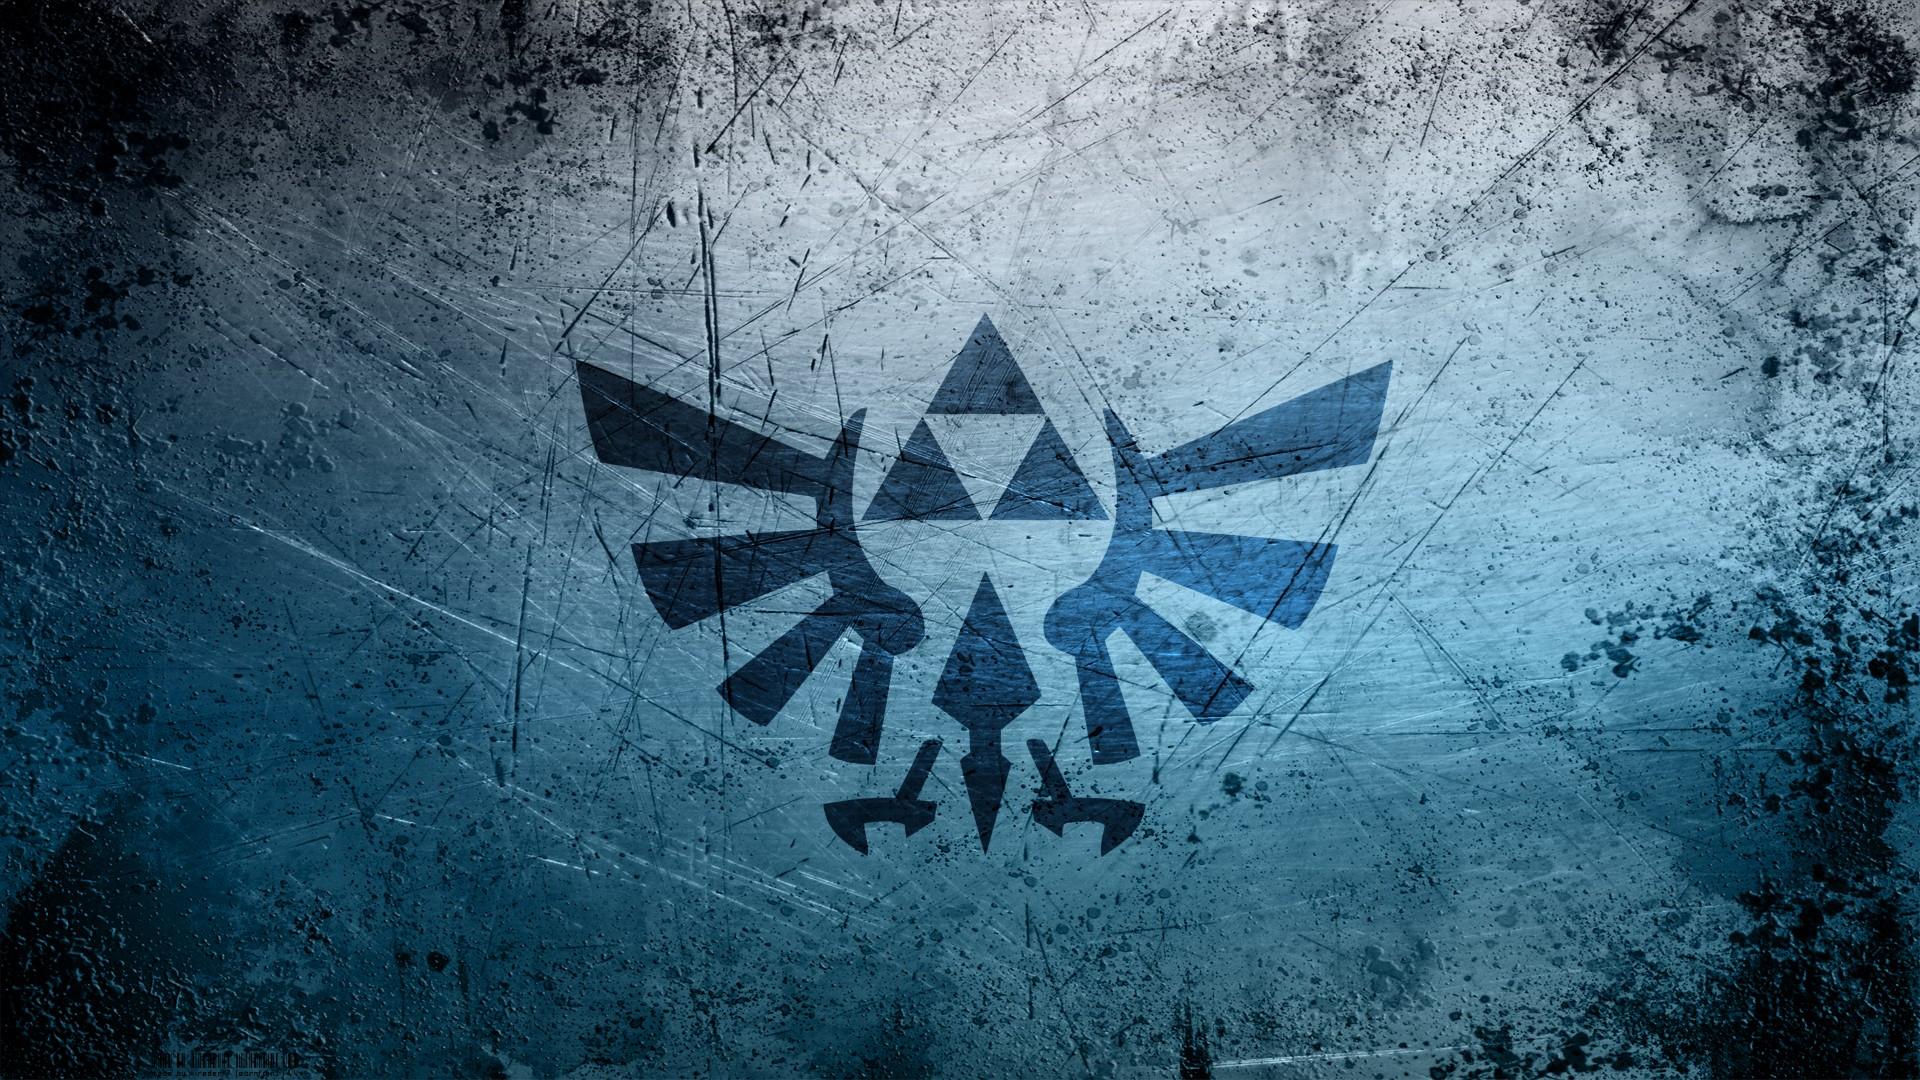 The Legend Of Zelda Hd Wallpaper Background Image